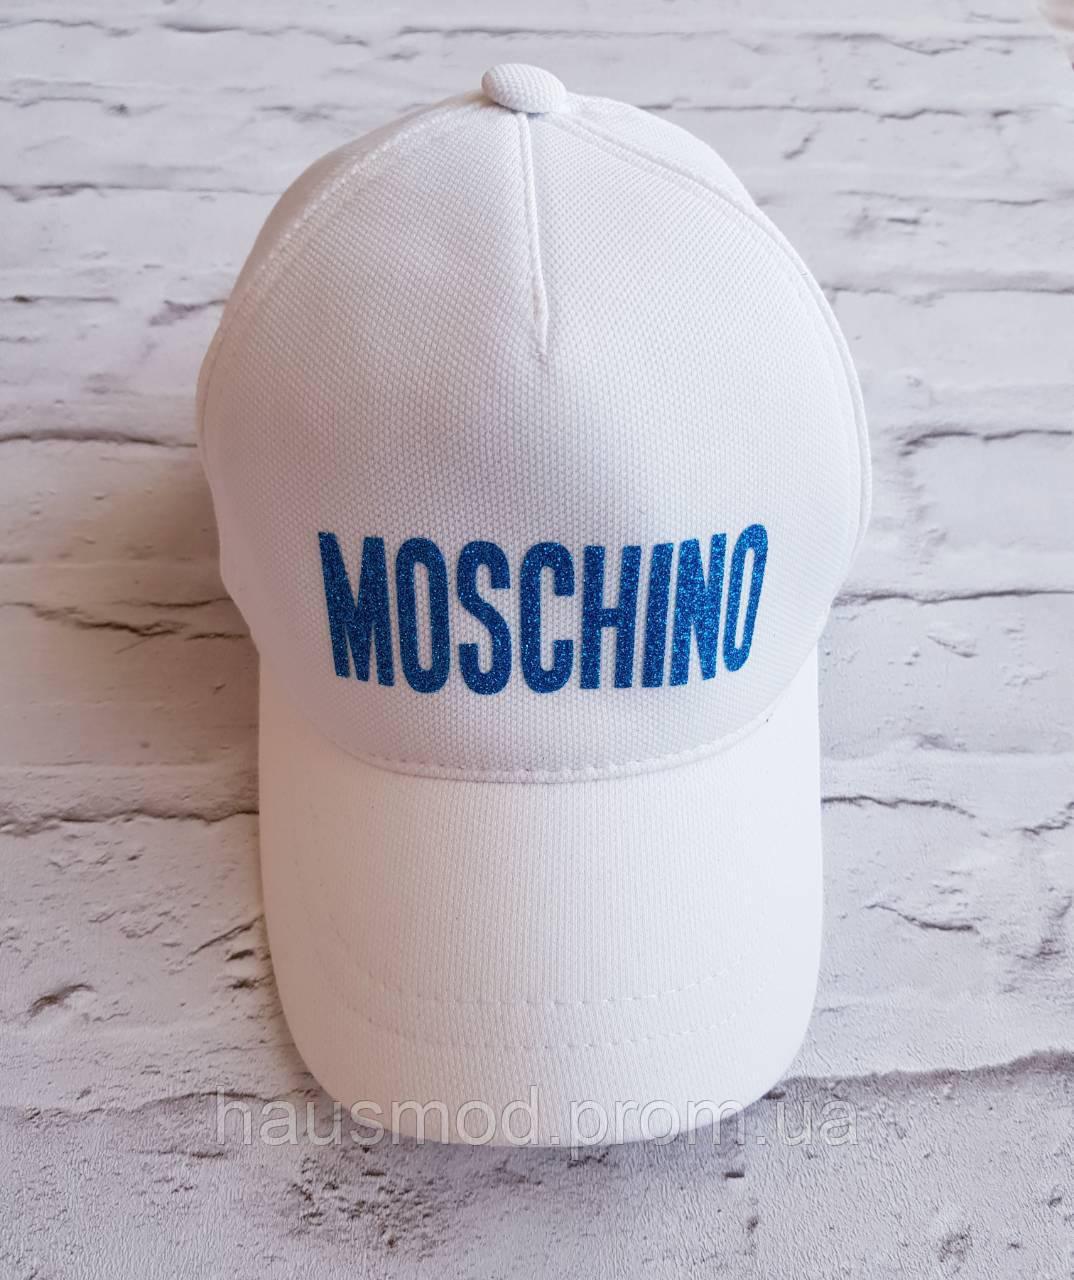 Хит сезона!  новинка женская кепка MOSCINO белая опт и розница со склада в одессе